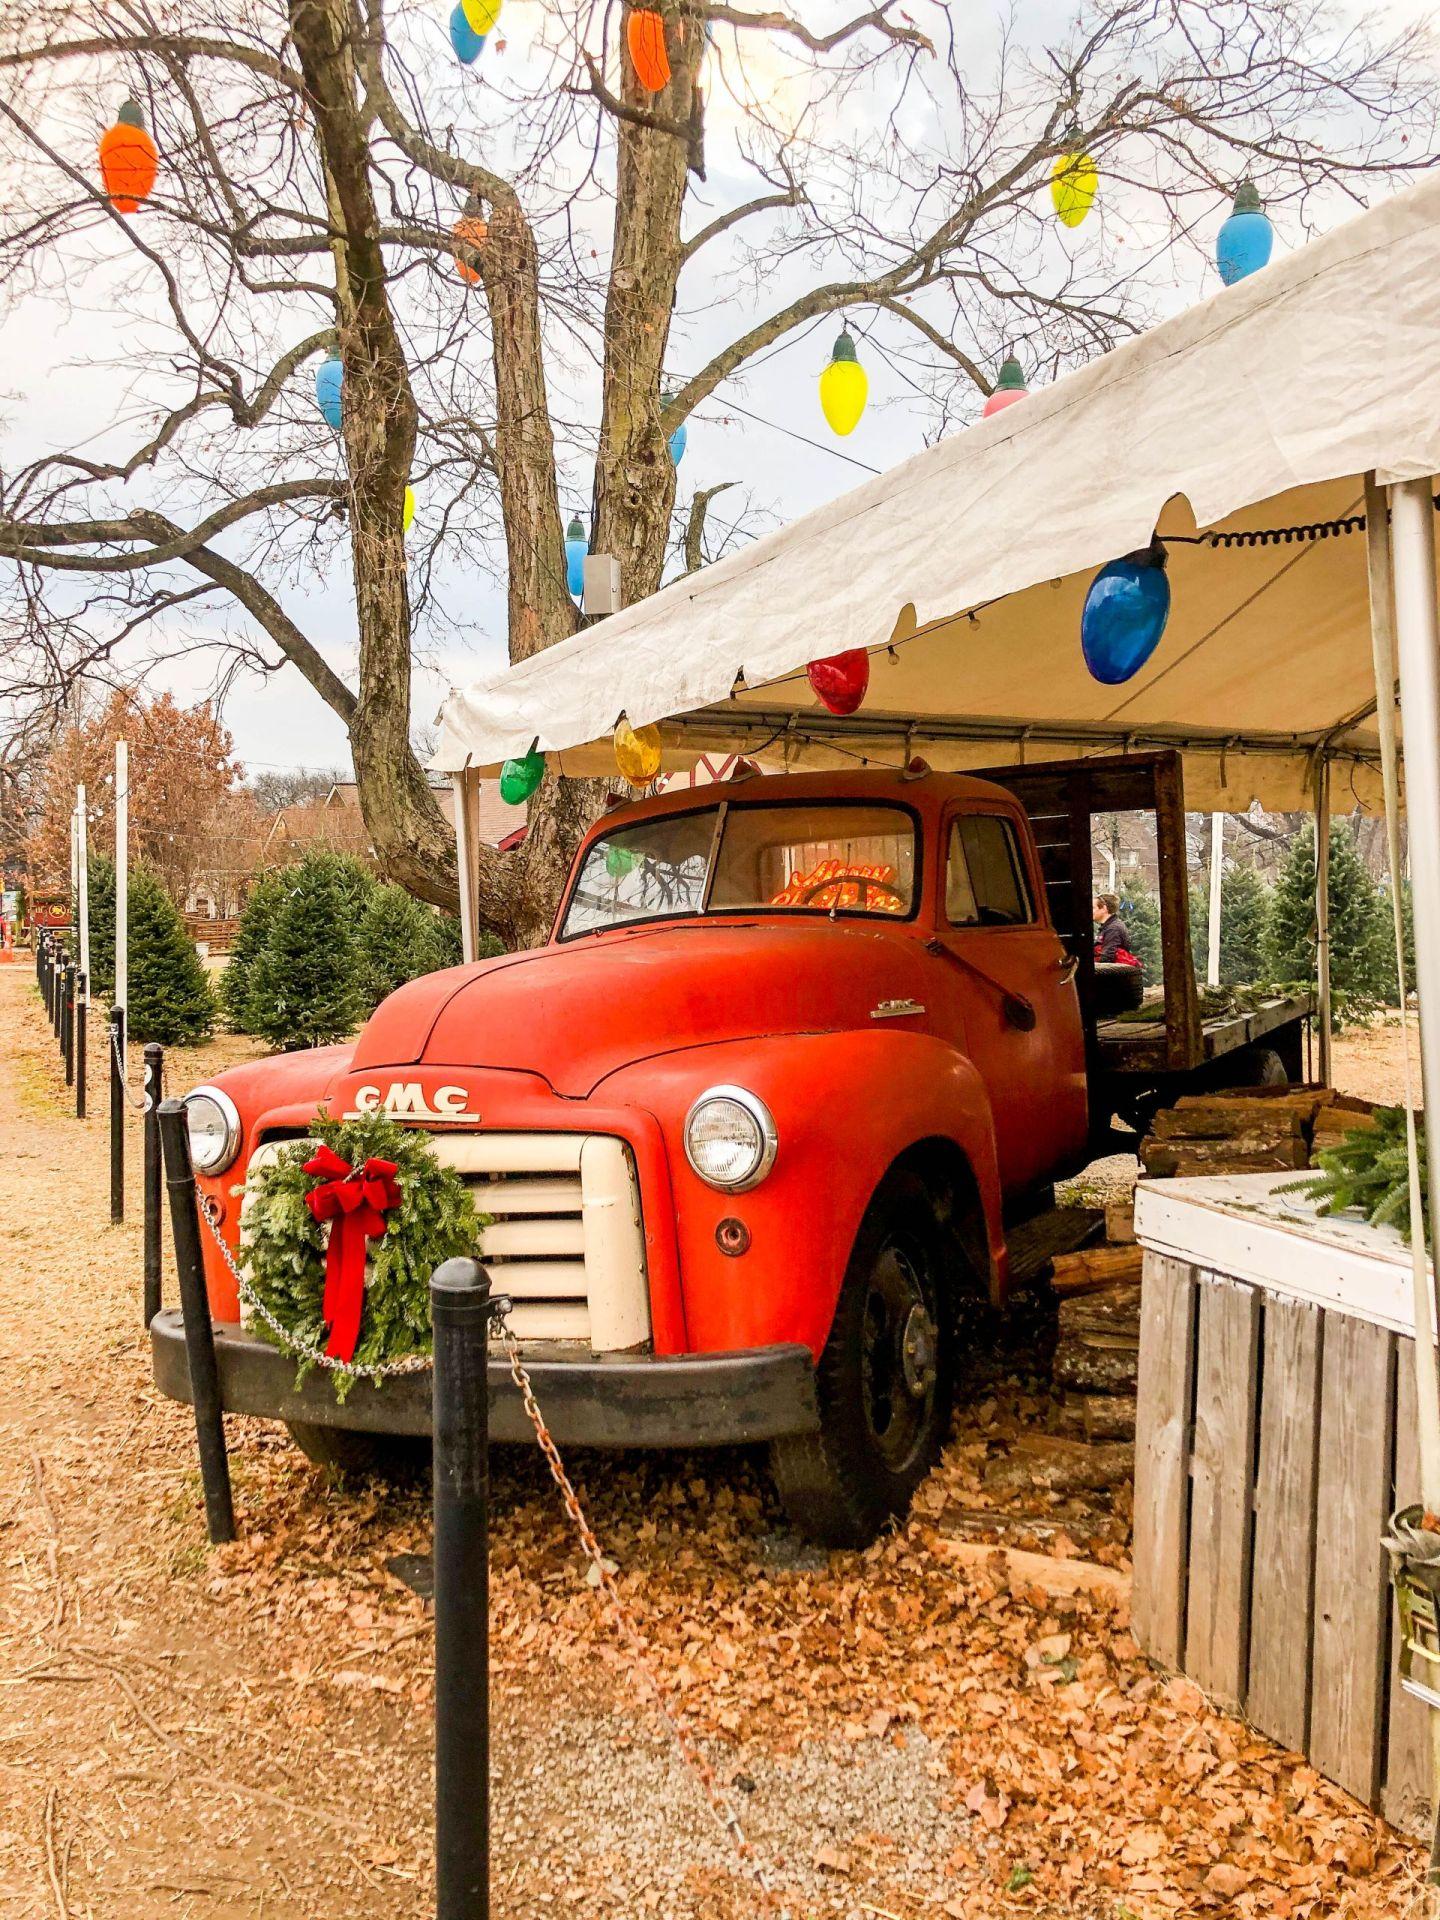 christmas trees nashville - december in nashville - 12south nashville